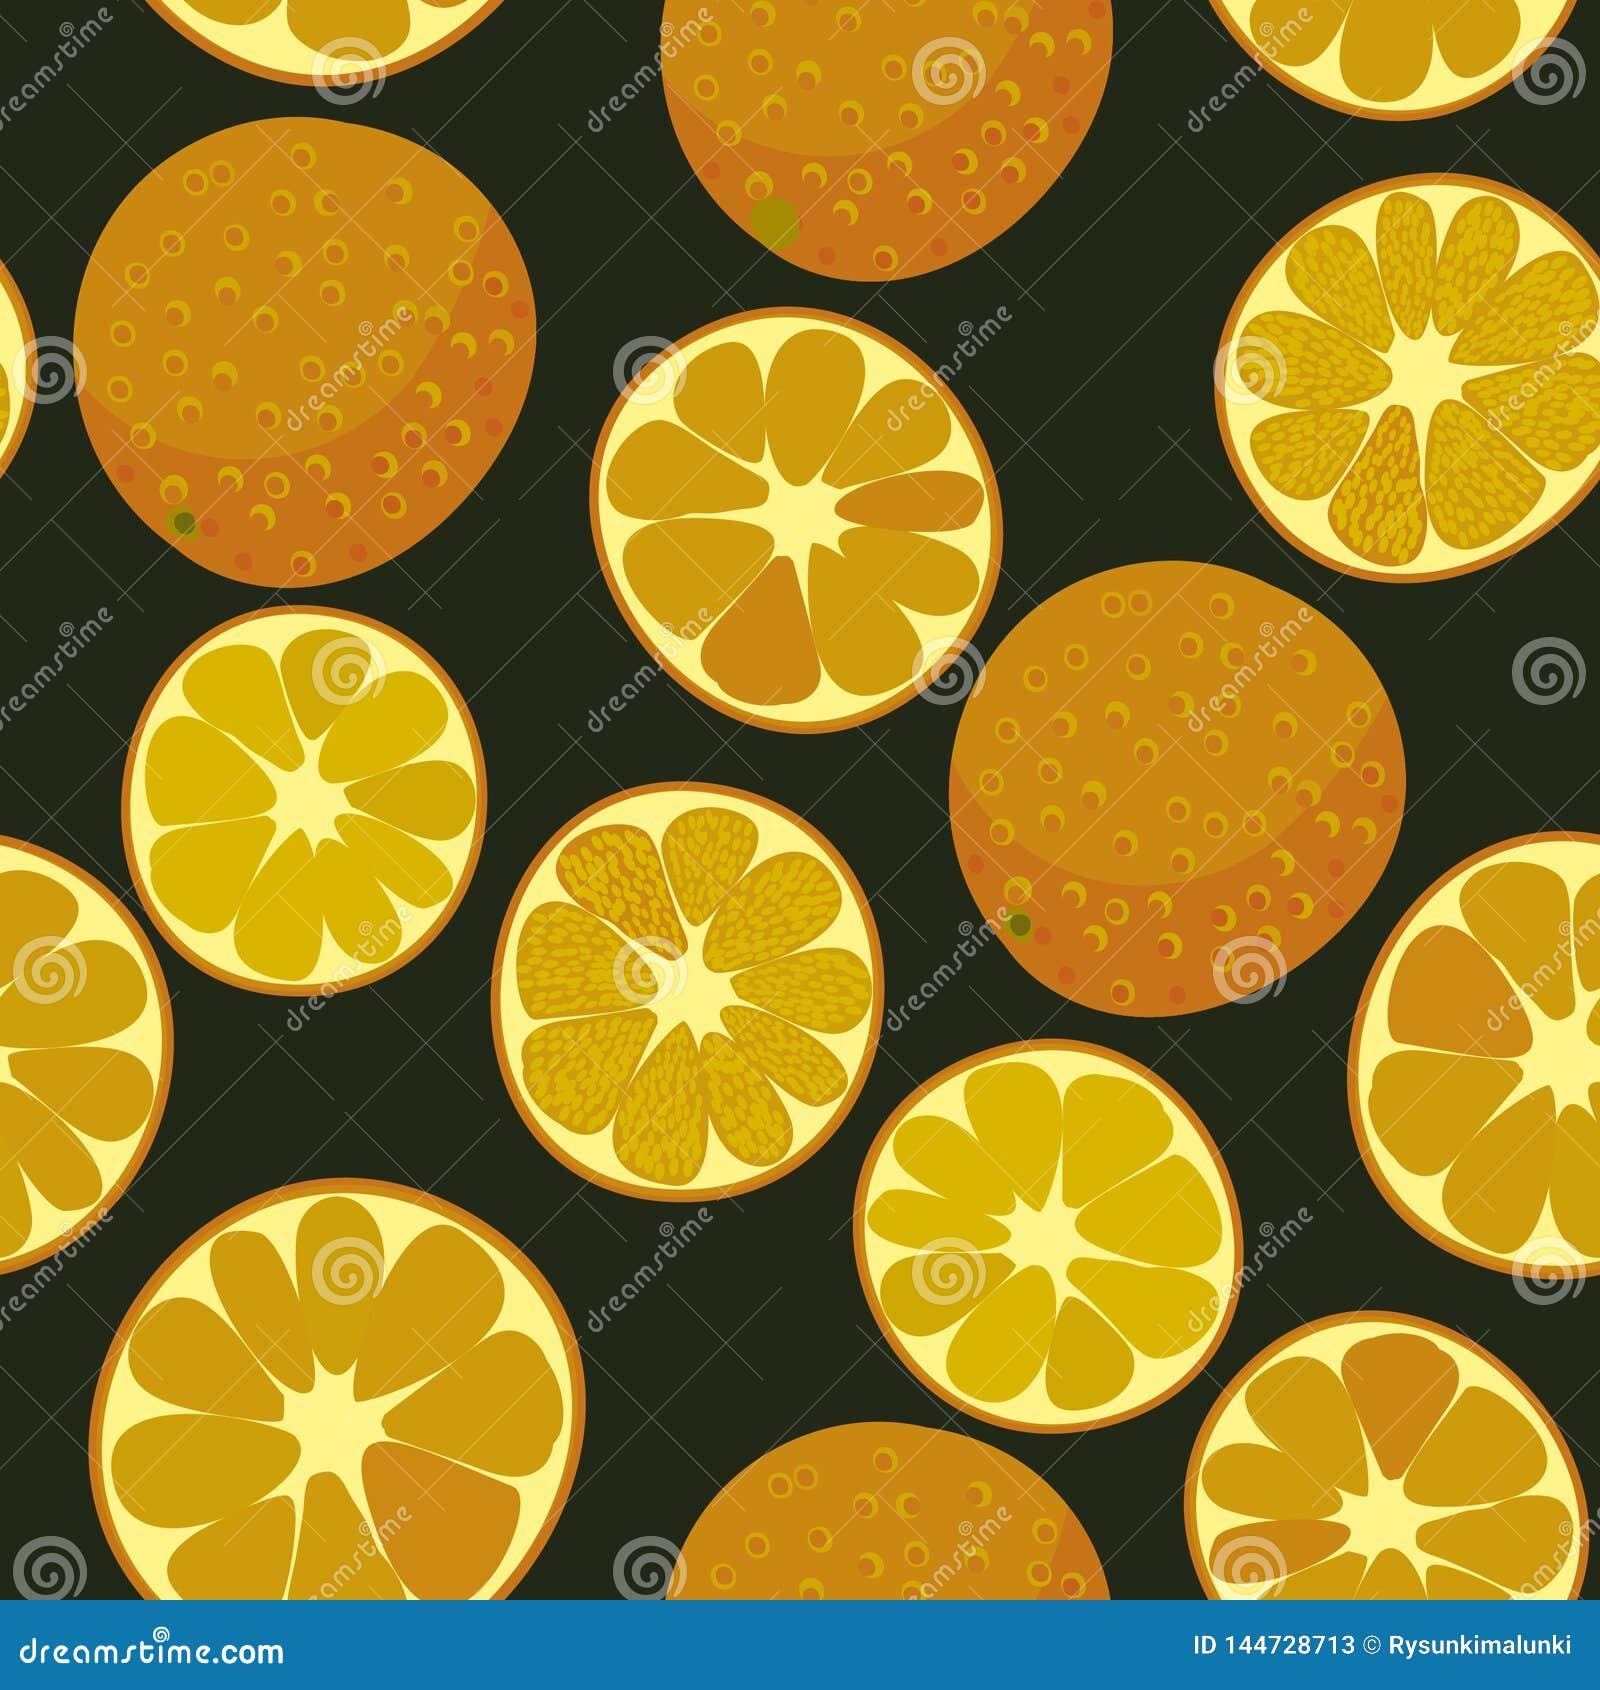 Ripe oranges on dark background seamless vector pattern